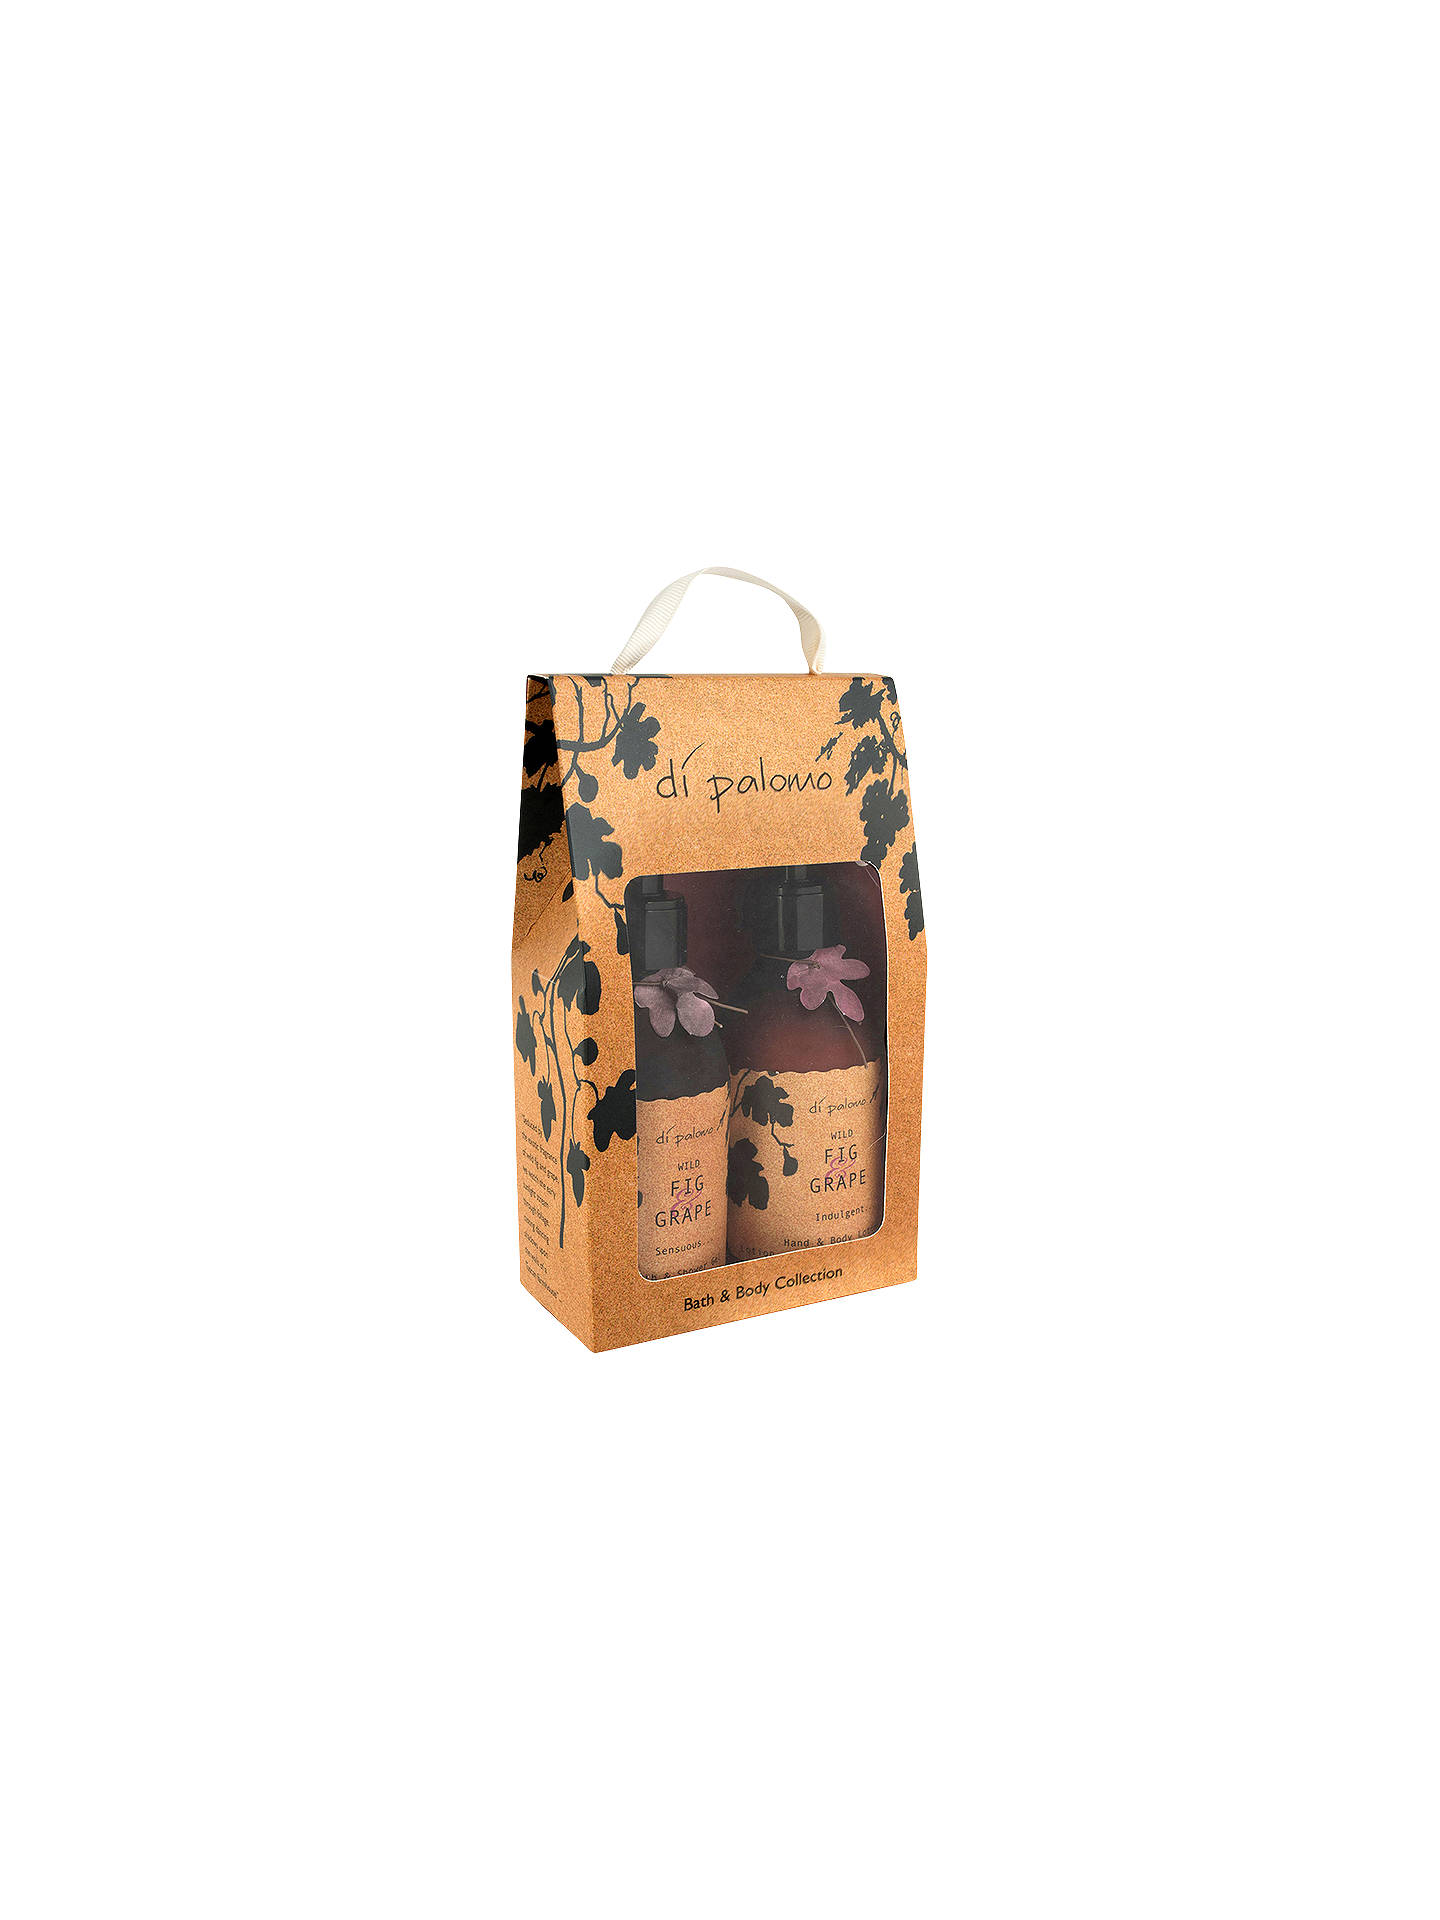 9c6b71f670 BuyDi Palomo Fig Bath   Body Gift Bag Online at johnlewis.com